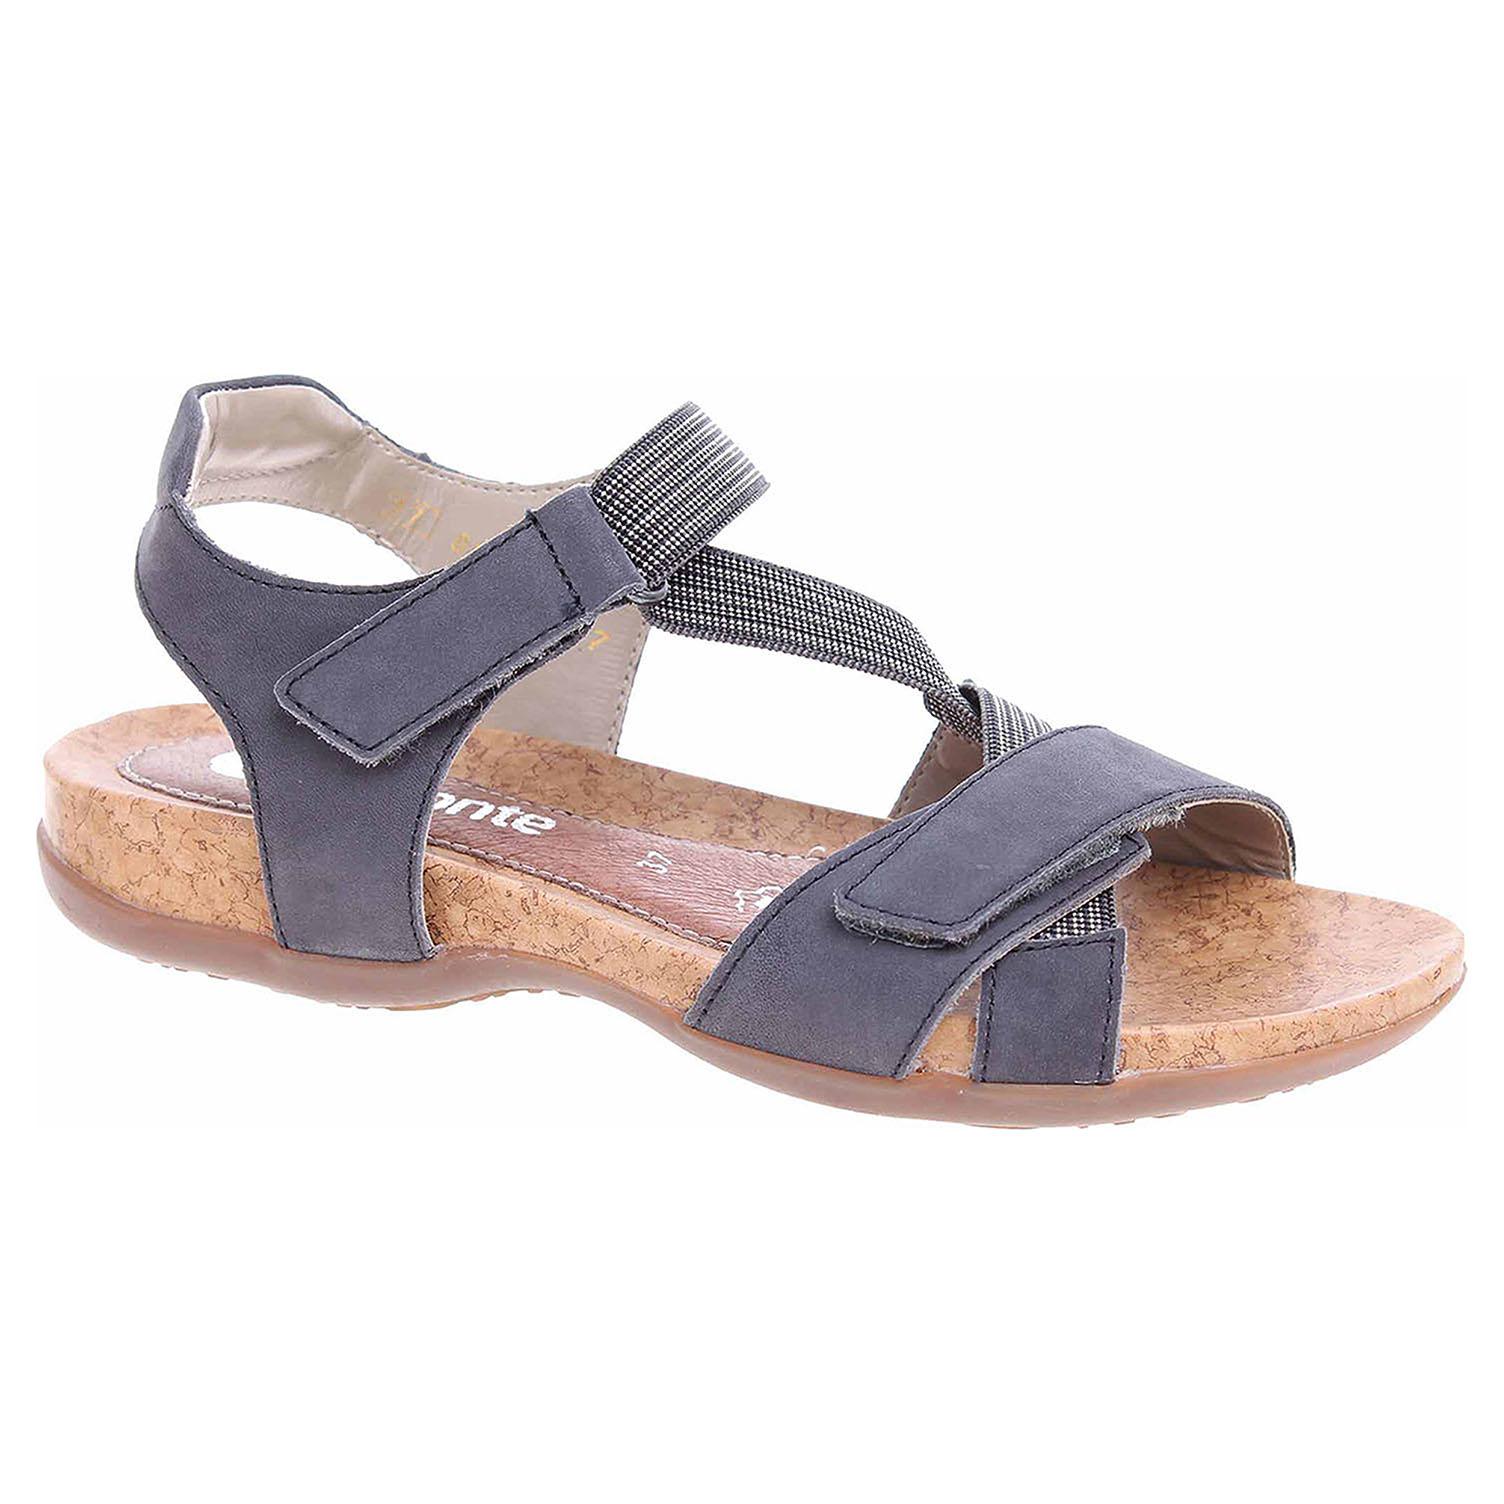 14c2b8a27248 Ecco Dámské sandály Remonte R3257-14 blau kombi 23801336